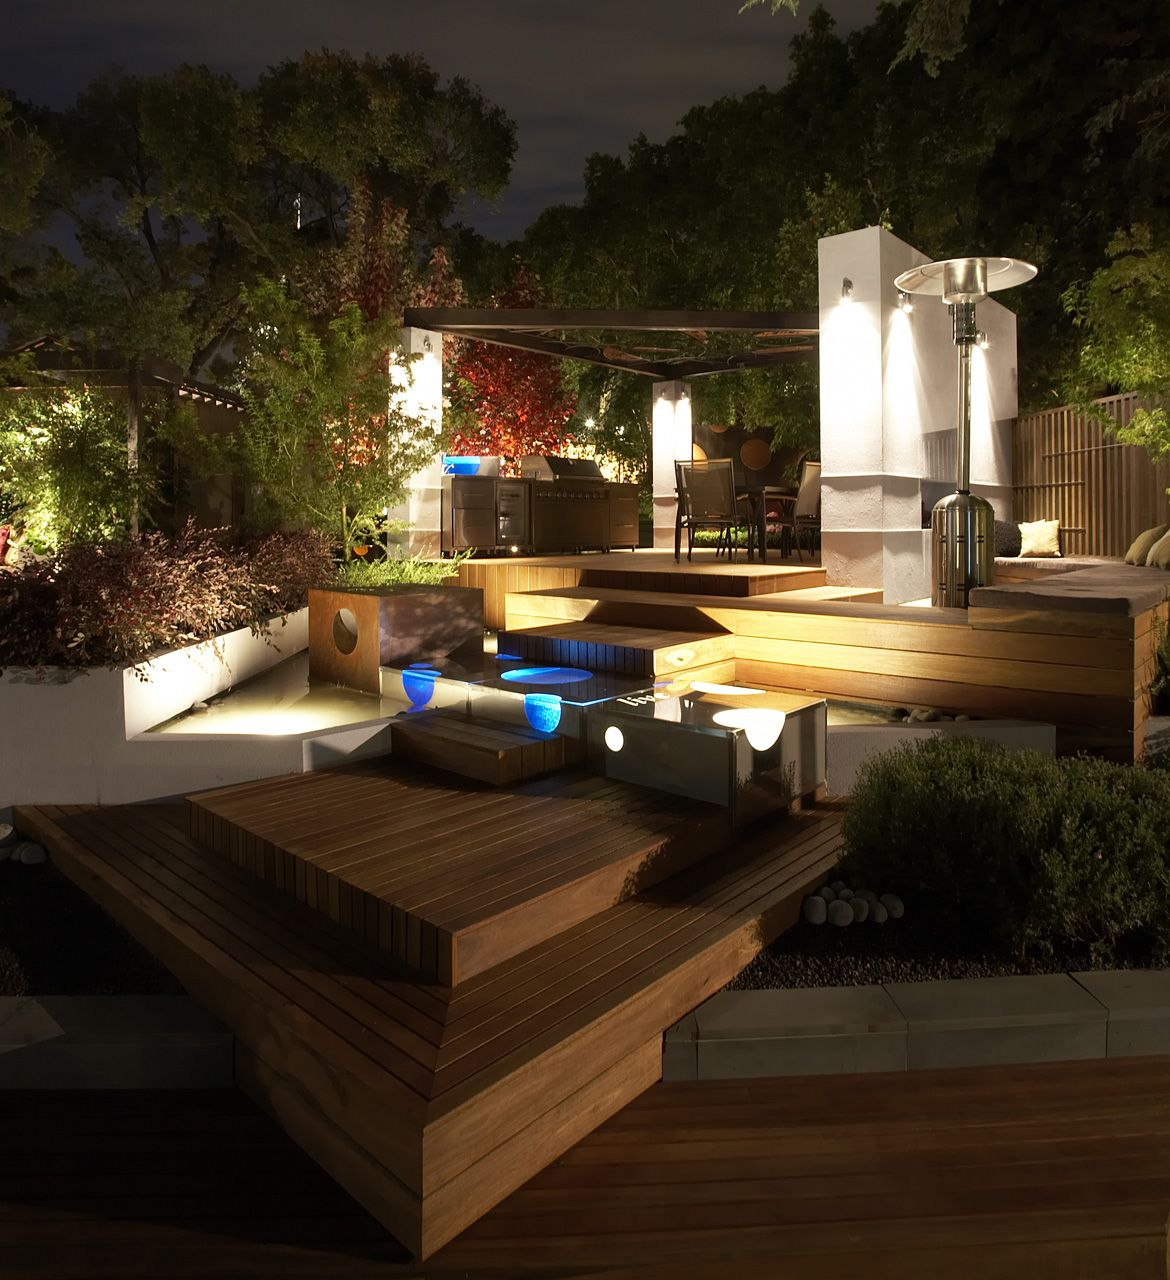 Pool Garten Gestaltung Schön A Modern Garden Deck